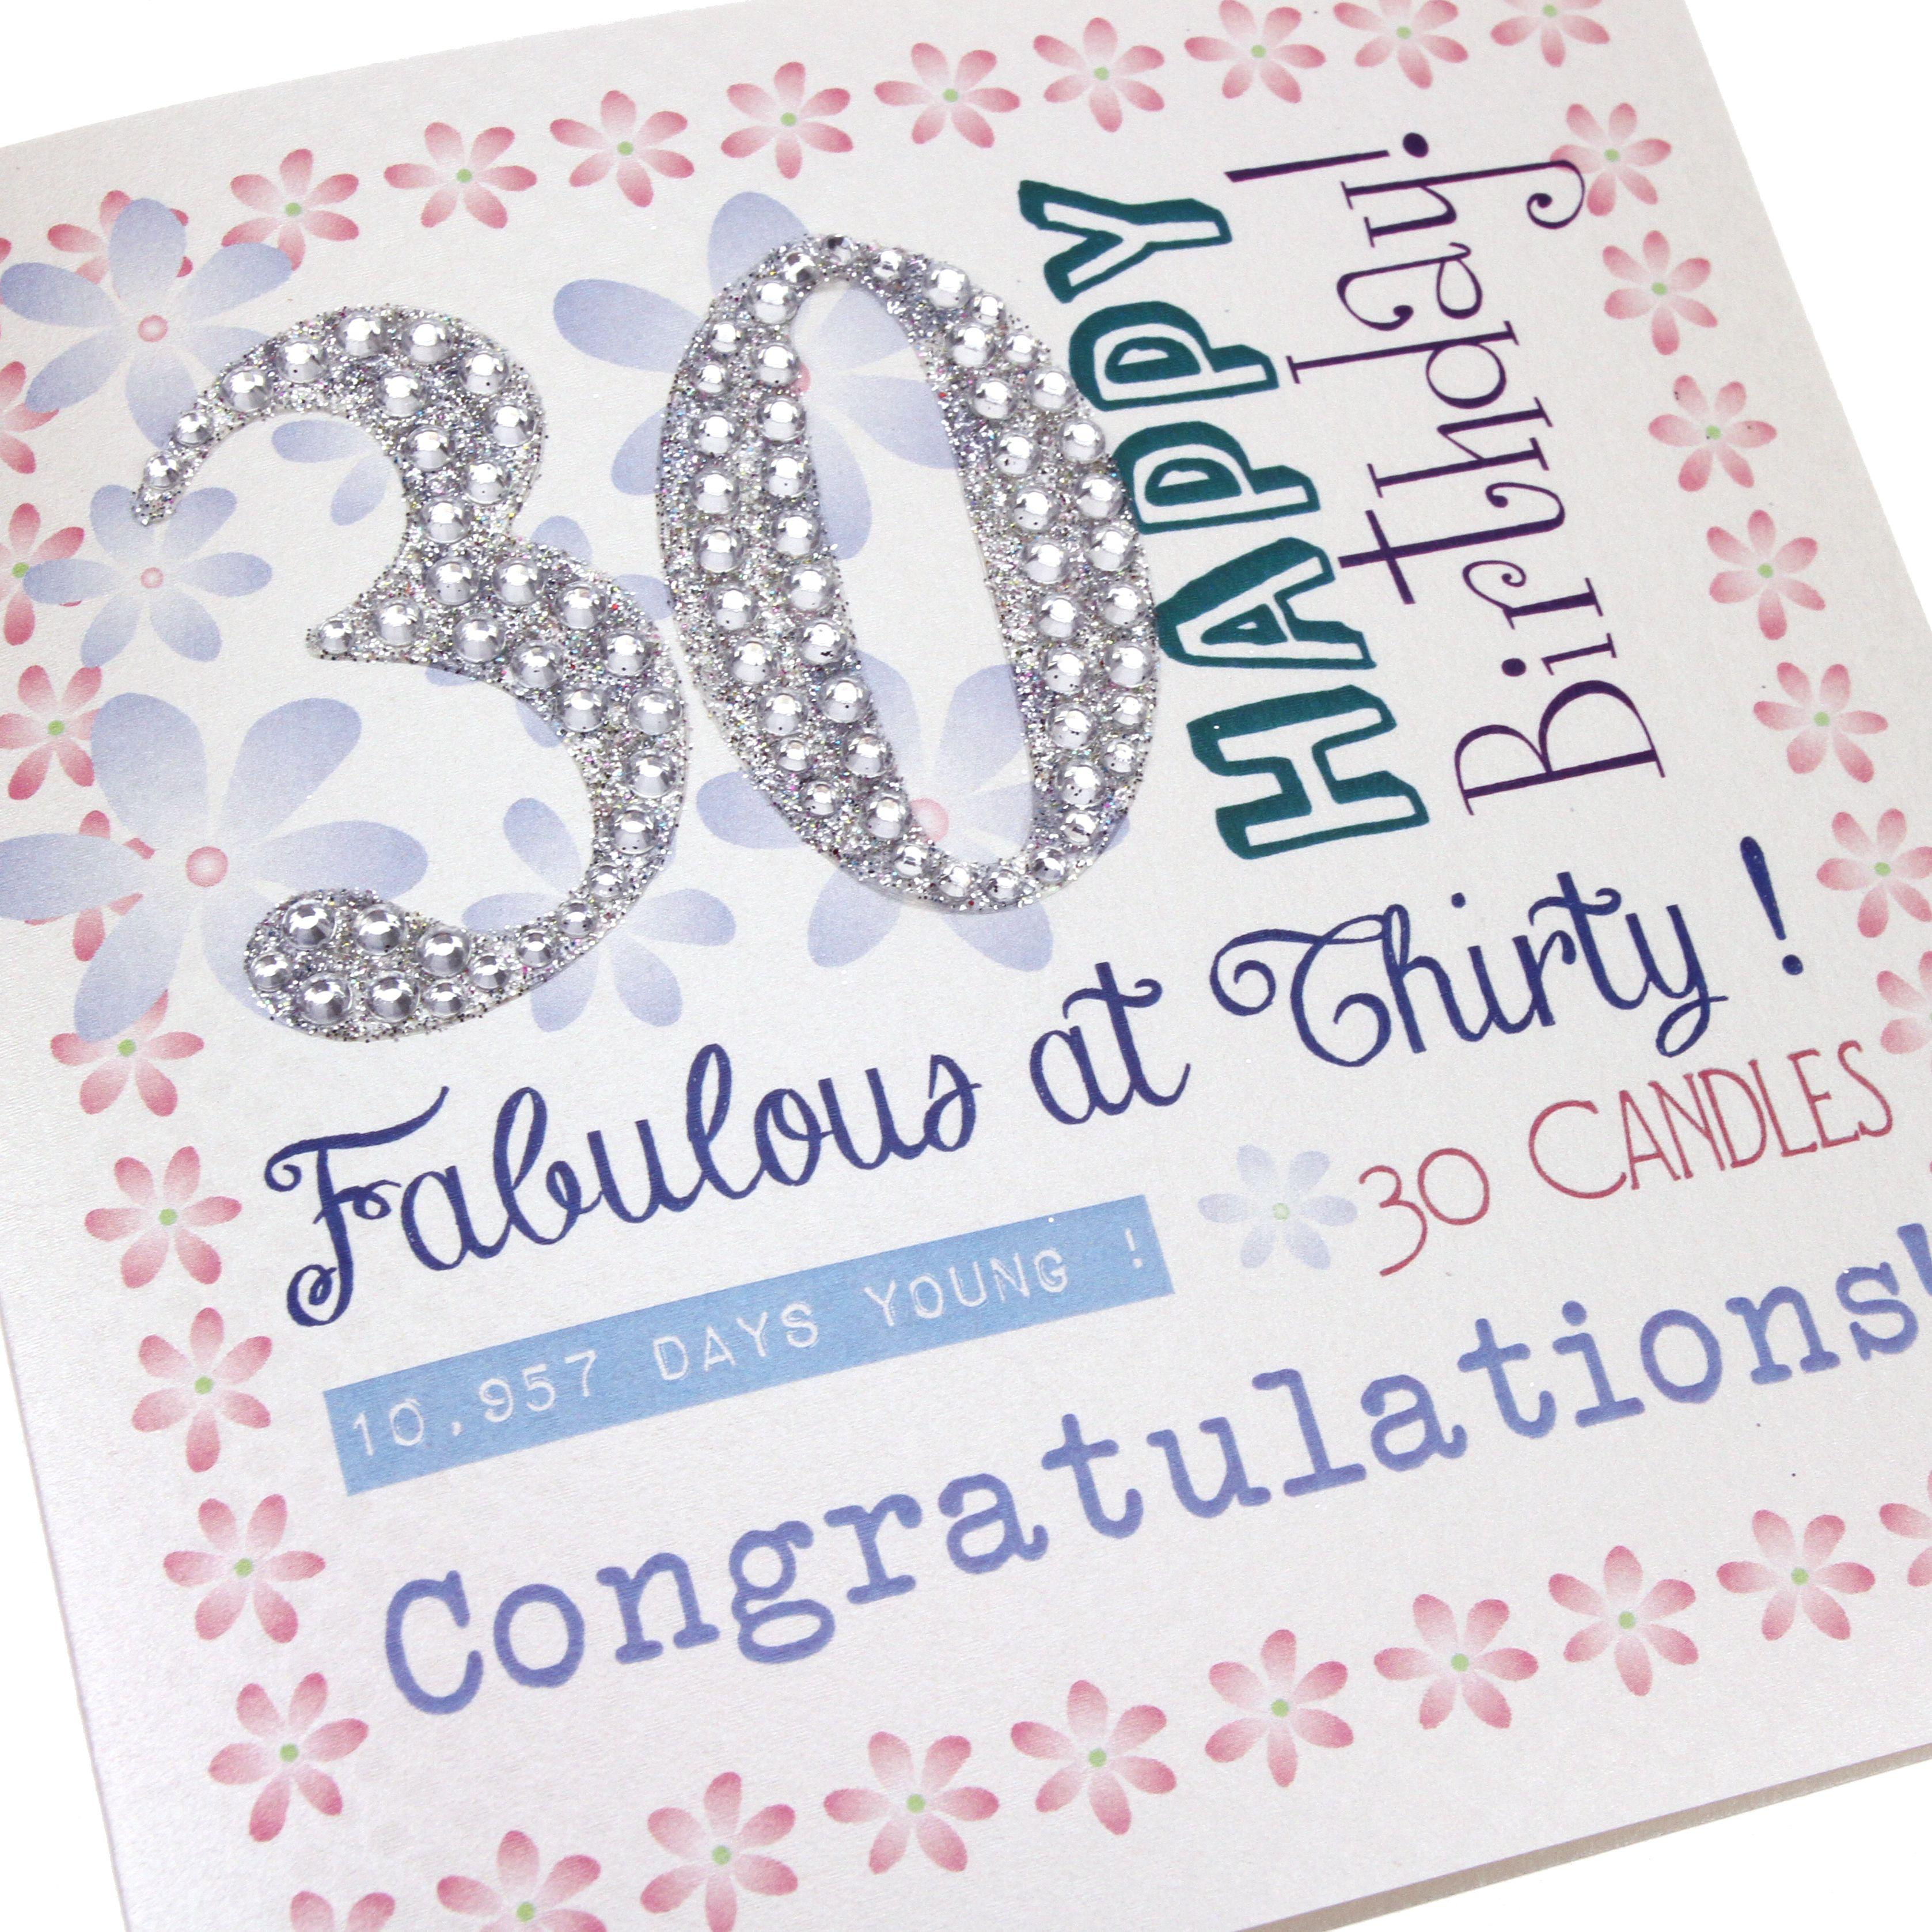 Marvelous Card Making Ideas 30th Birthday Part - 3: Handmade 30th Birthday Card Female Flowers Pink Diamanté Numbers -  U0027Fabulous At Thirty!u0027